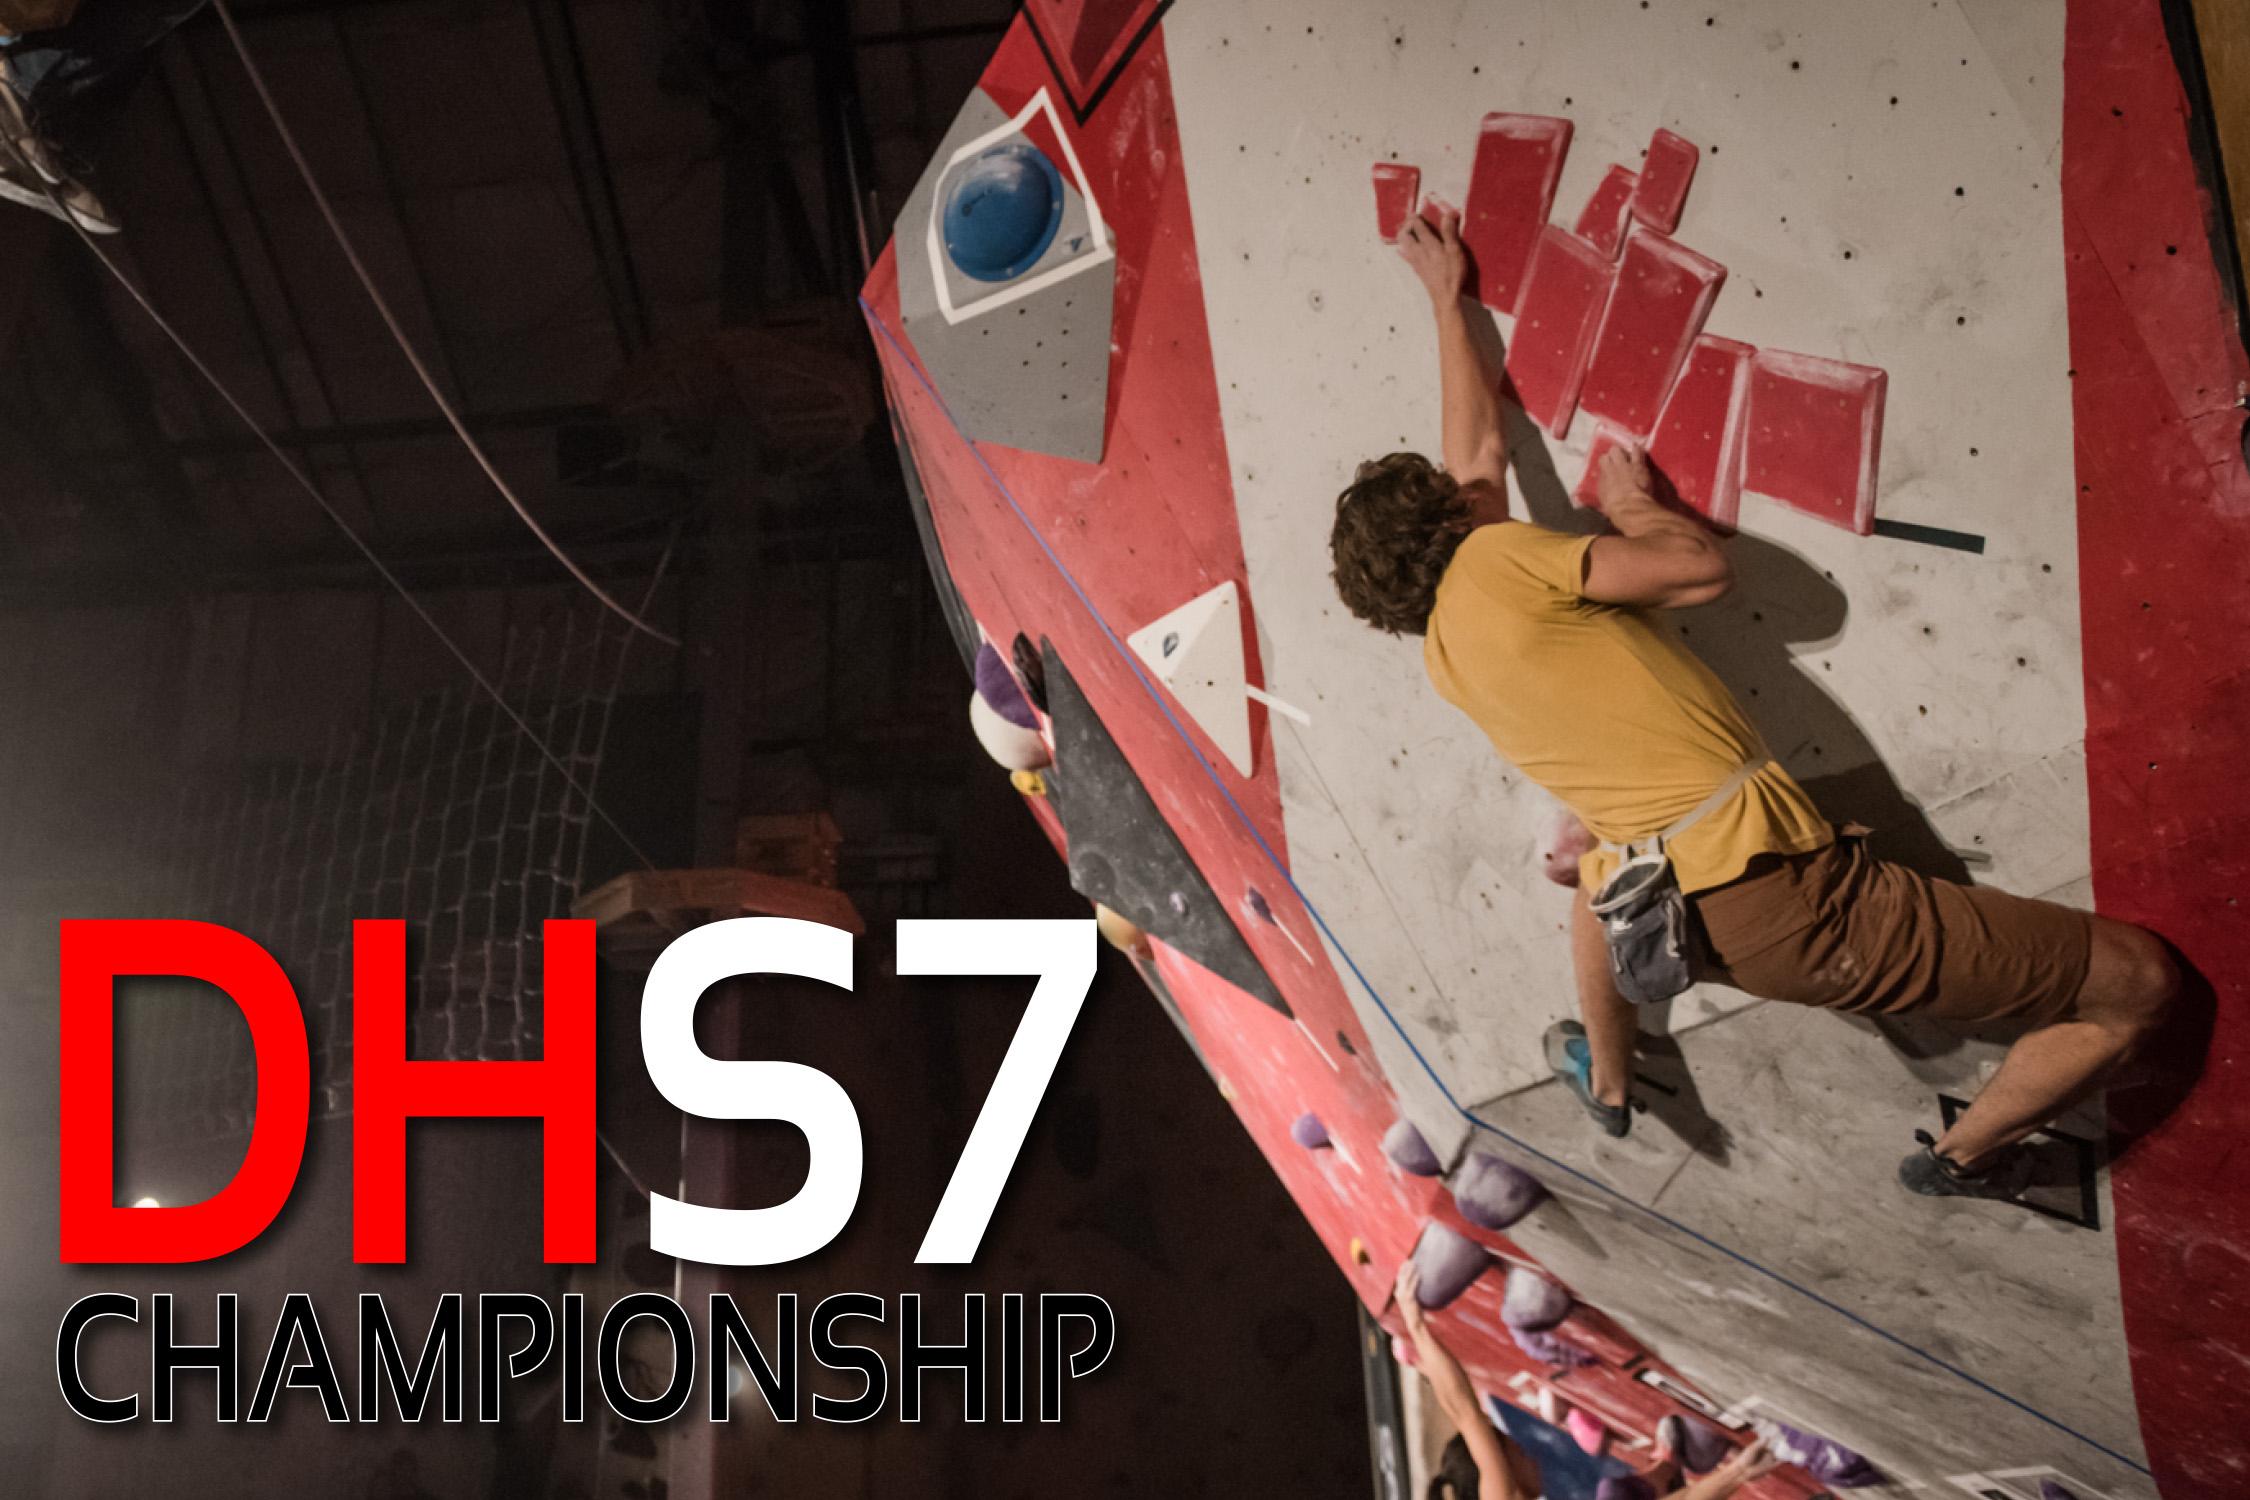 DHS7 - CHAMPIONSHIP